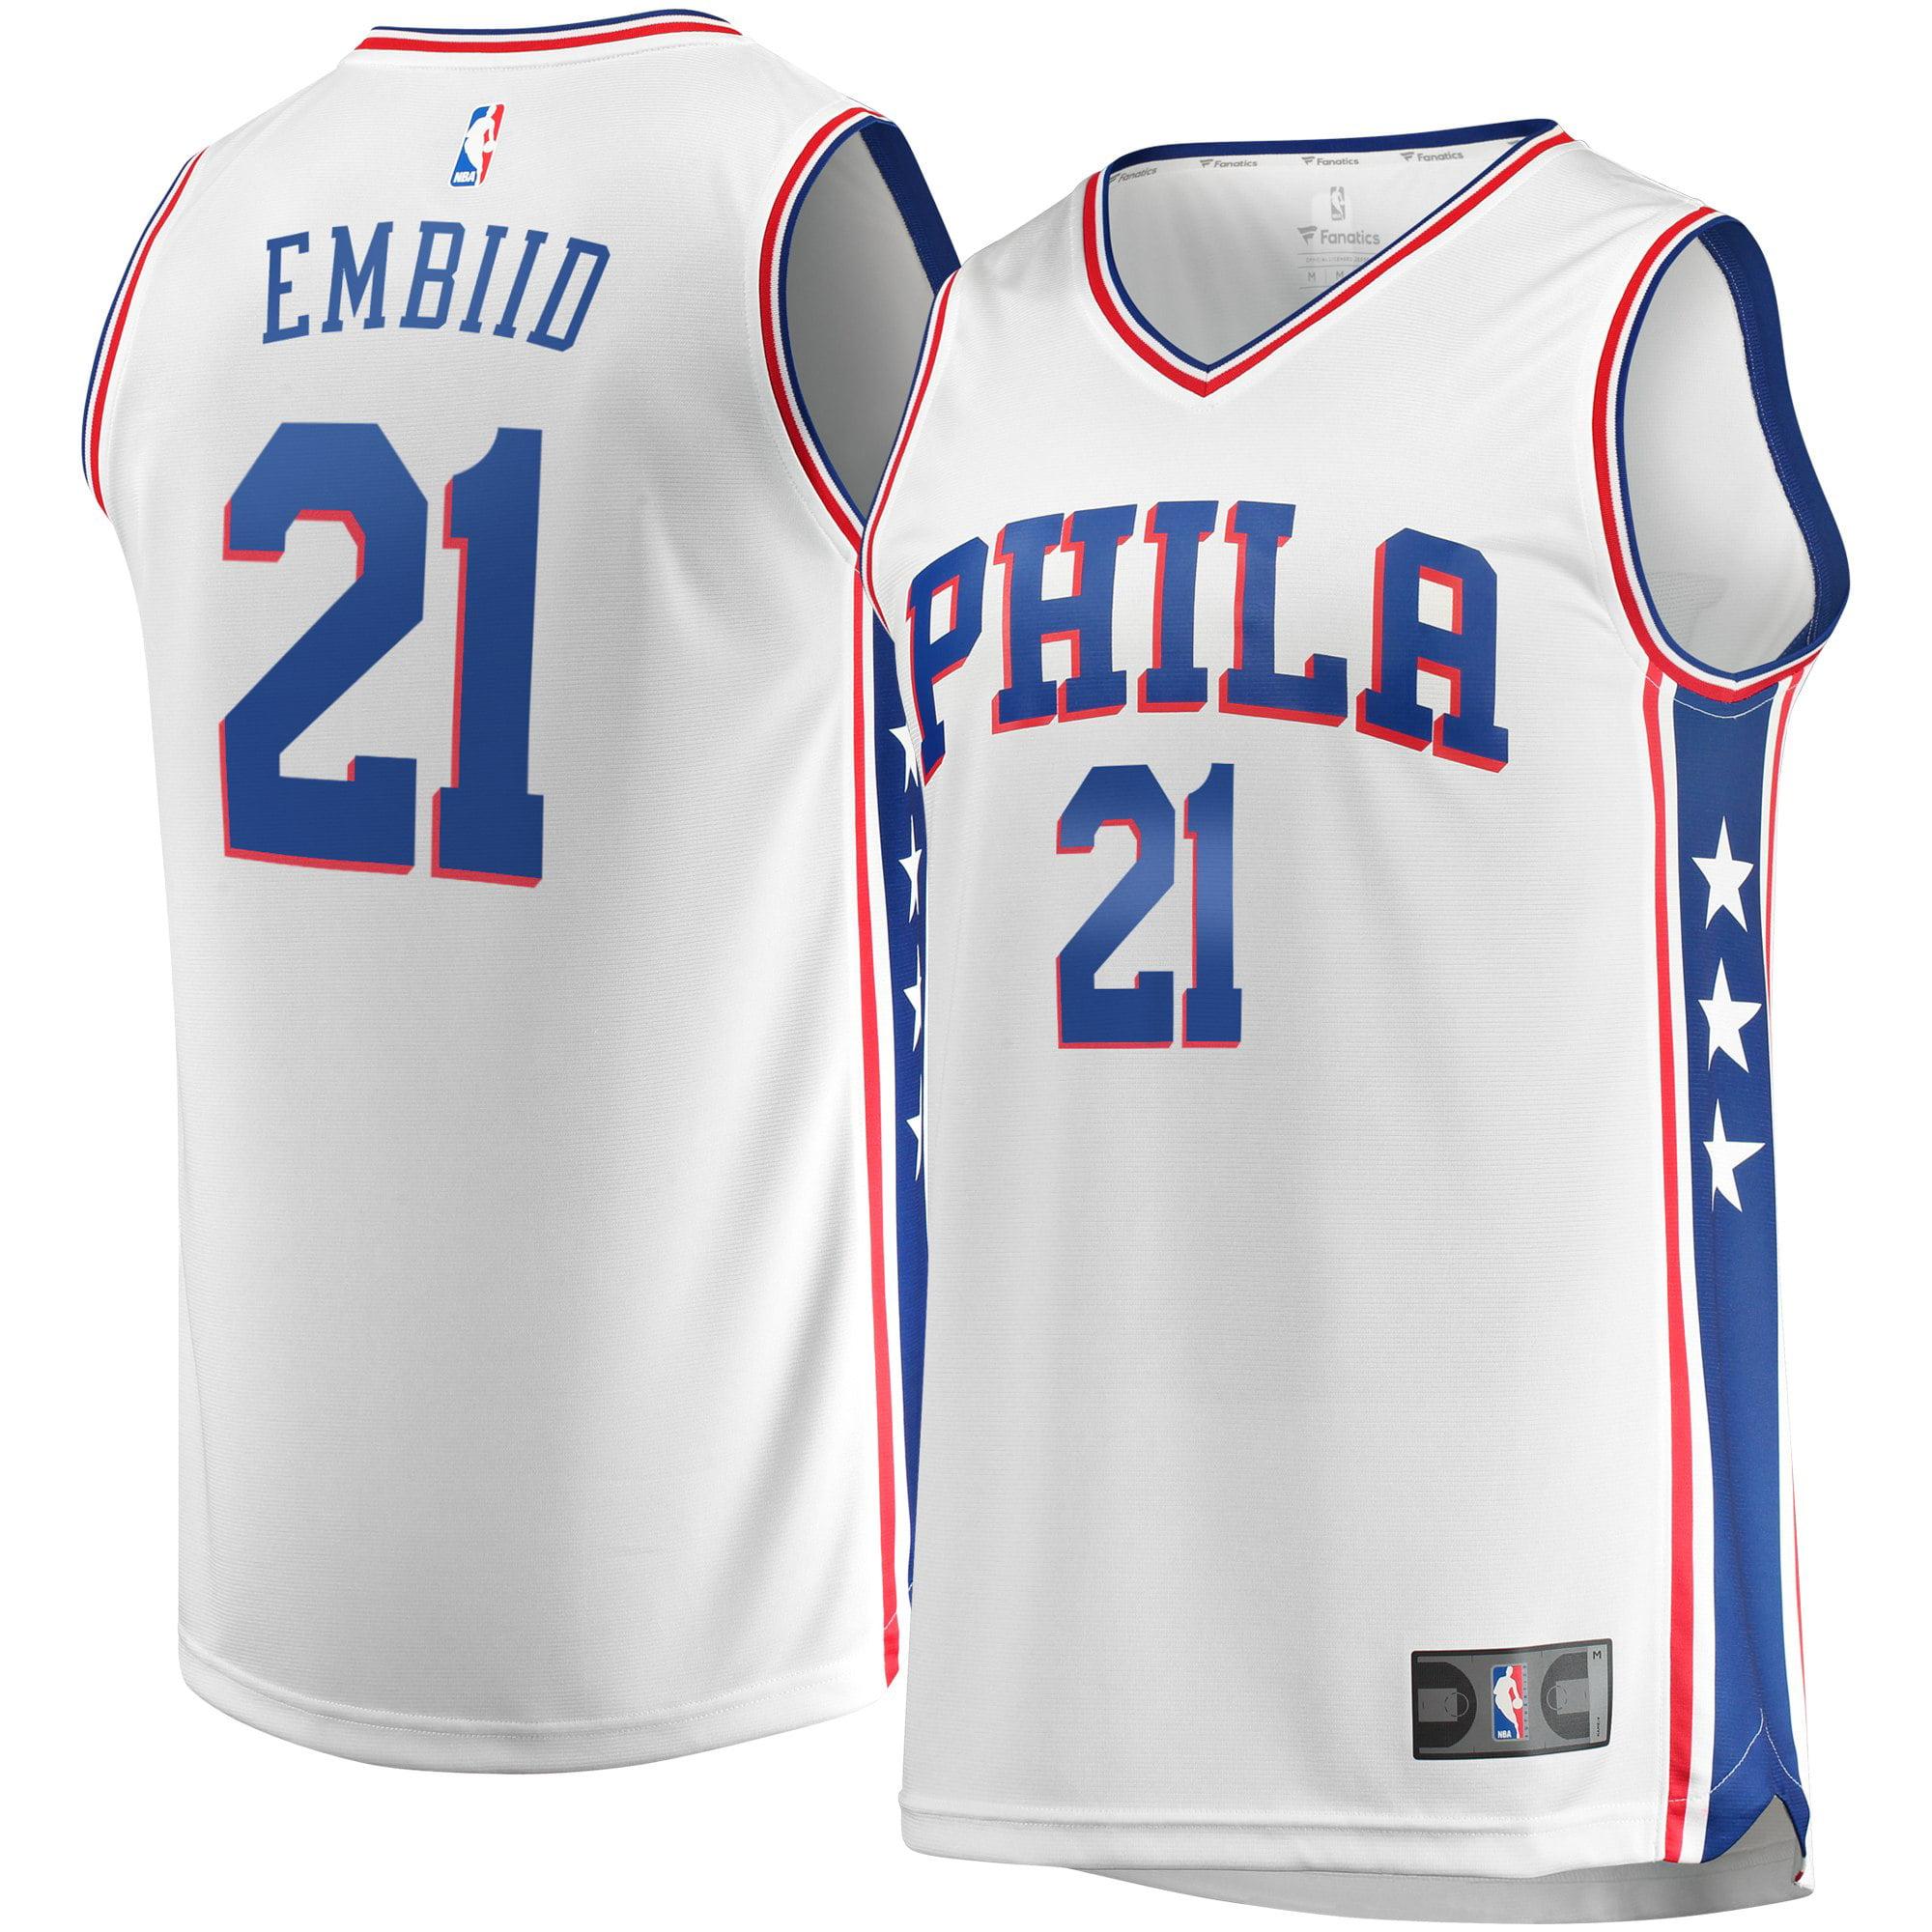 Joel Embiid Philadelphia 76ers Fanatics Branded Youth Fast Break Replica Player Jersey - Association Edition - White